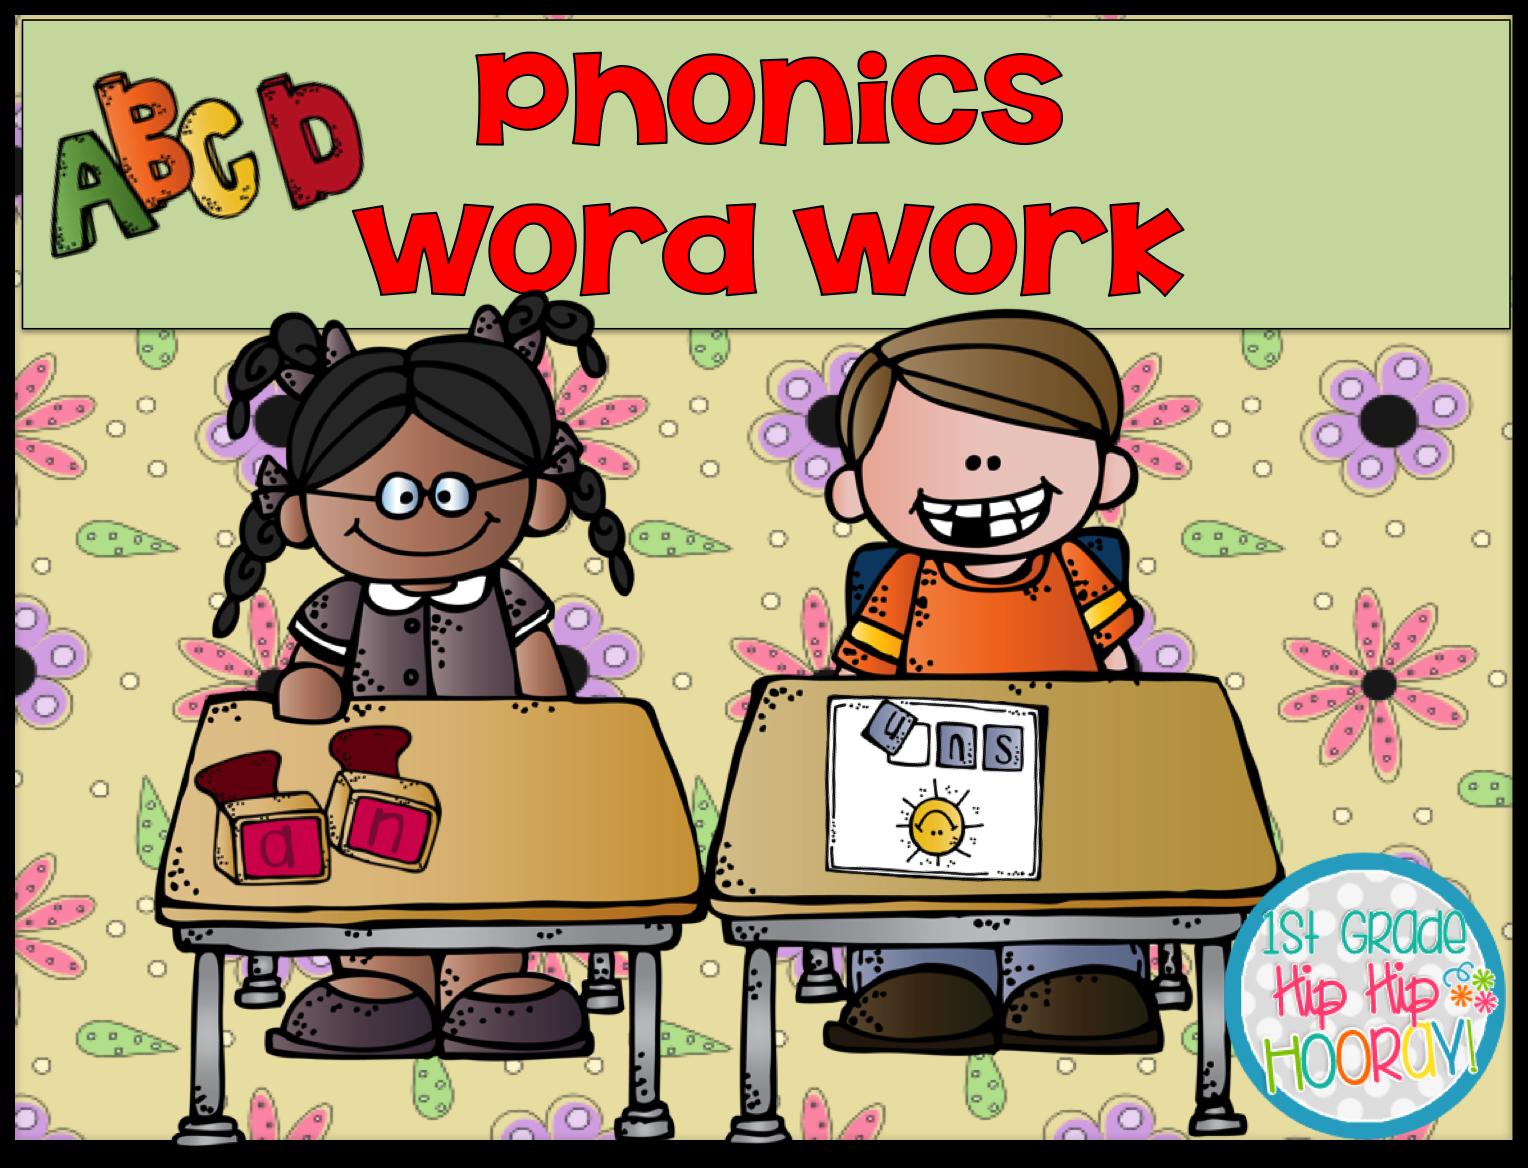 1st Grade Hip Hip Hooray Phonics Practice Blends Digraphs Vowel Teams And More